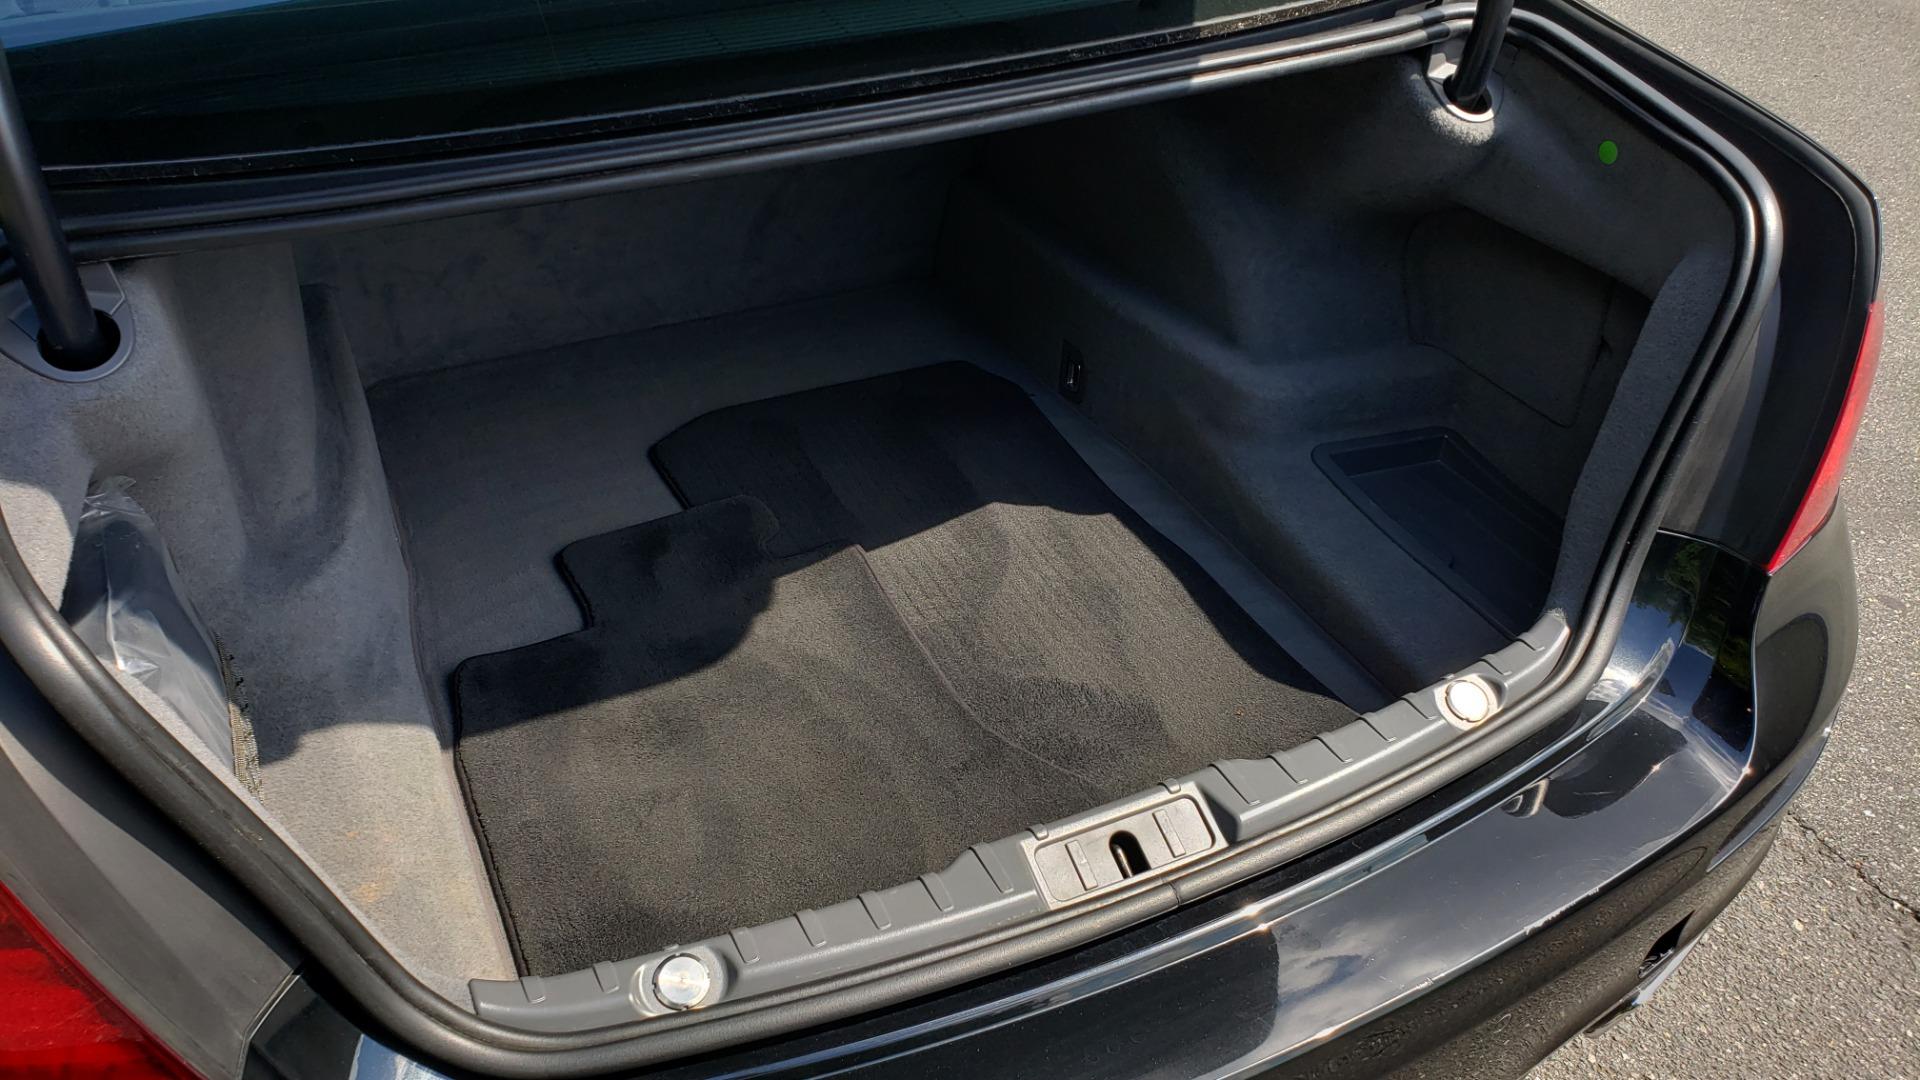 Used 2014 BMW 7 SERIES 750LI M-SPORT / EXEC PKG / DRVR ASST / LIGHTING / NAV / SUNROOF for sale Sold at Formula Imports in Charlotte NC 28227 13